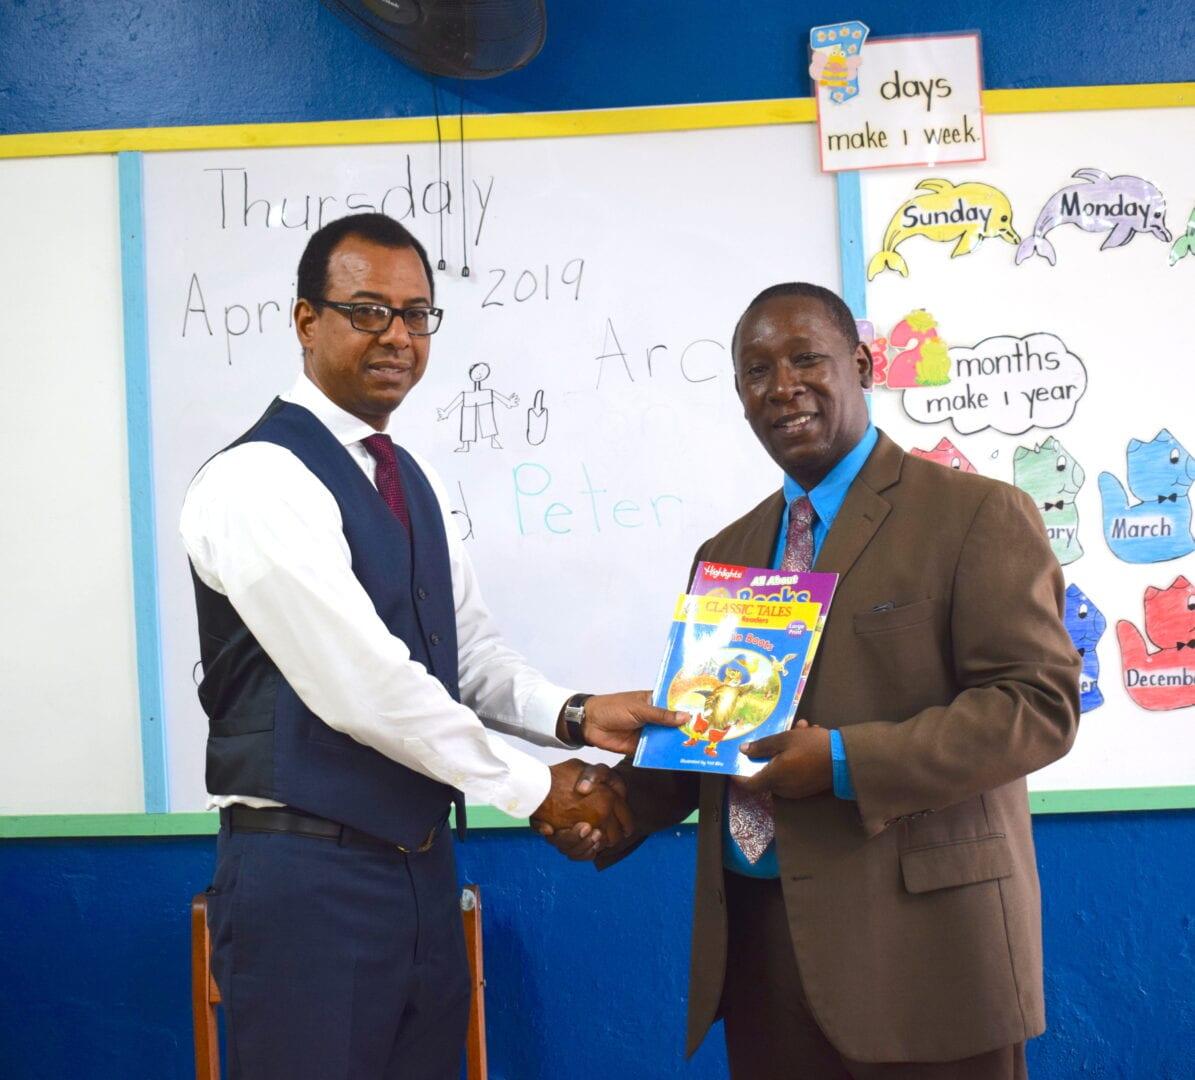 ARC Donates Storybooks to Dupont Primary